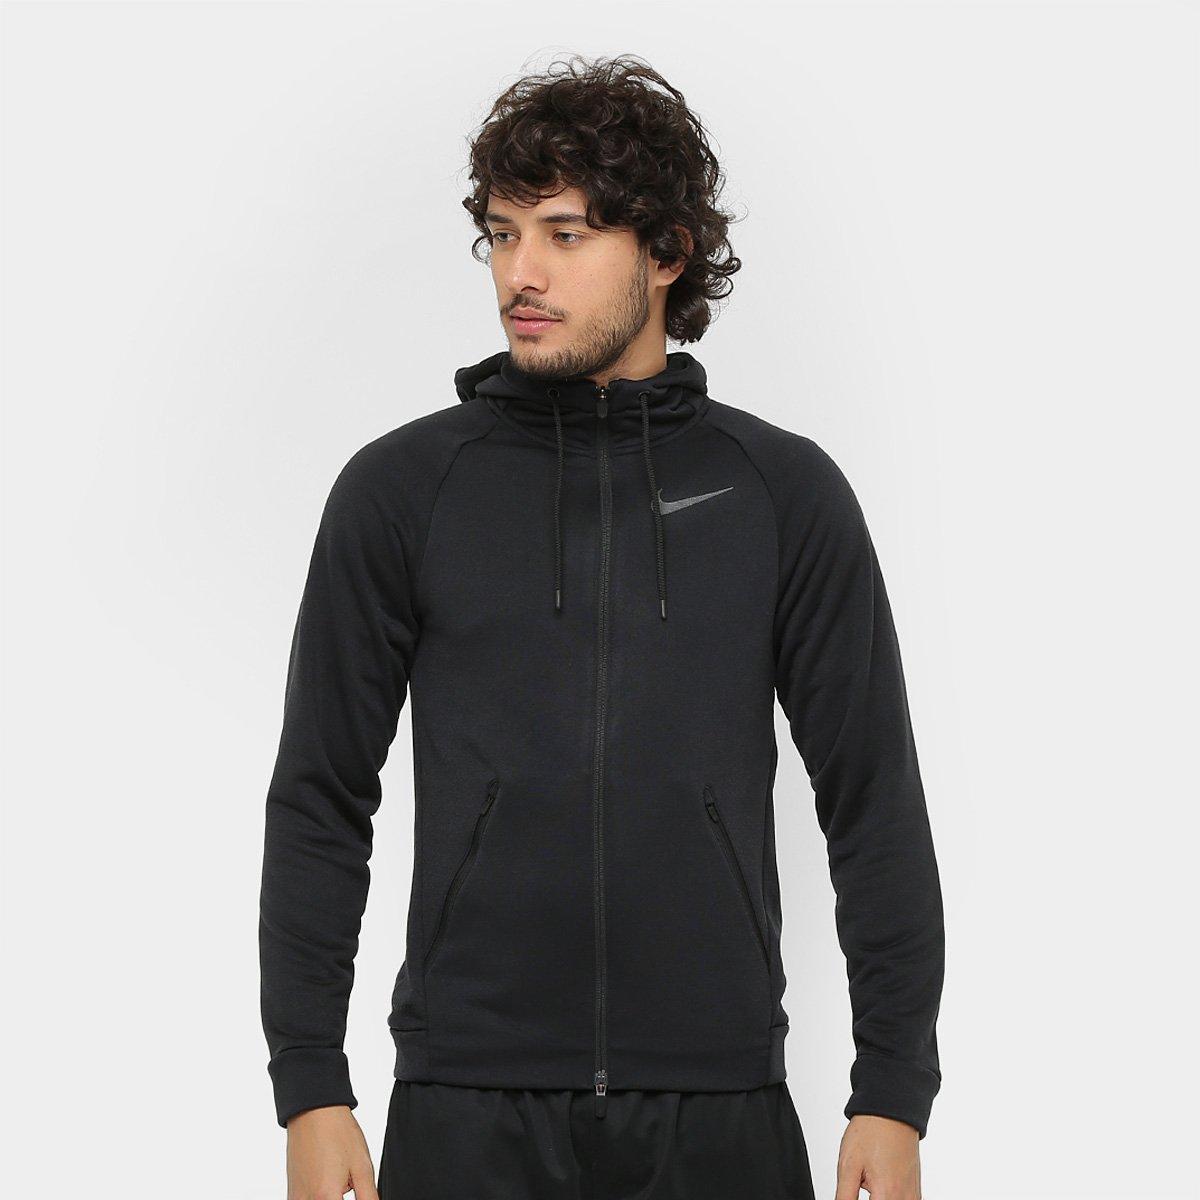 3e2e84aed5a Jaqueta Nike Hyper Fleece Dry Masculina - Compre Agora